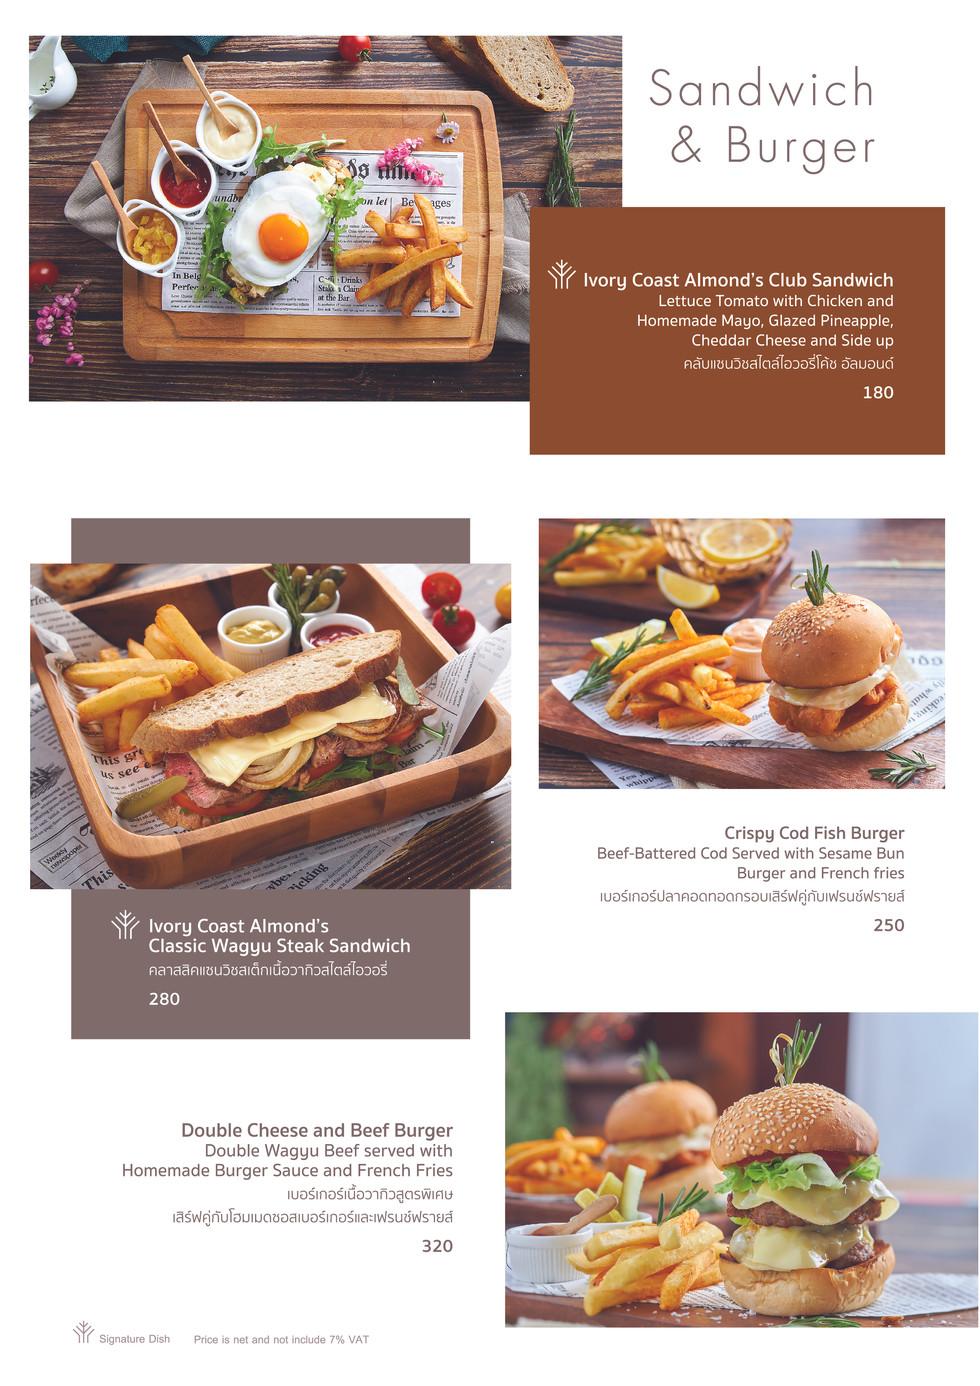 ivc new menu_03.jpg